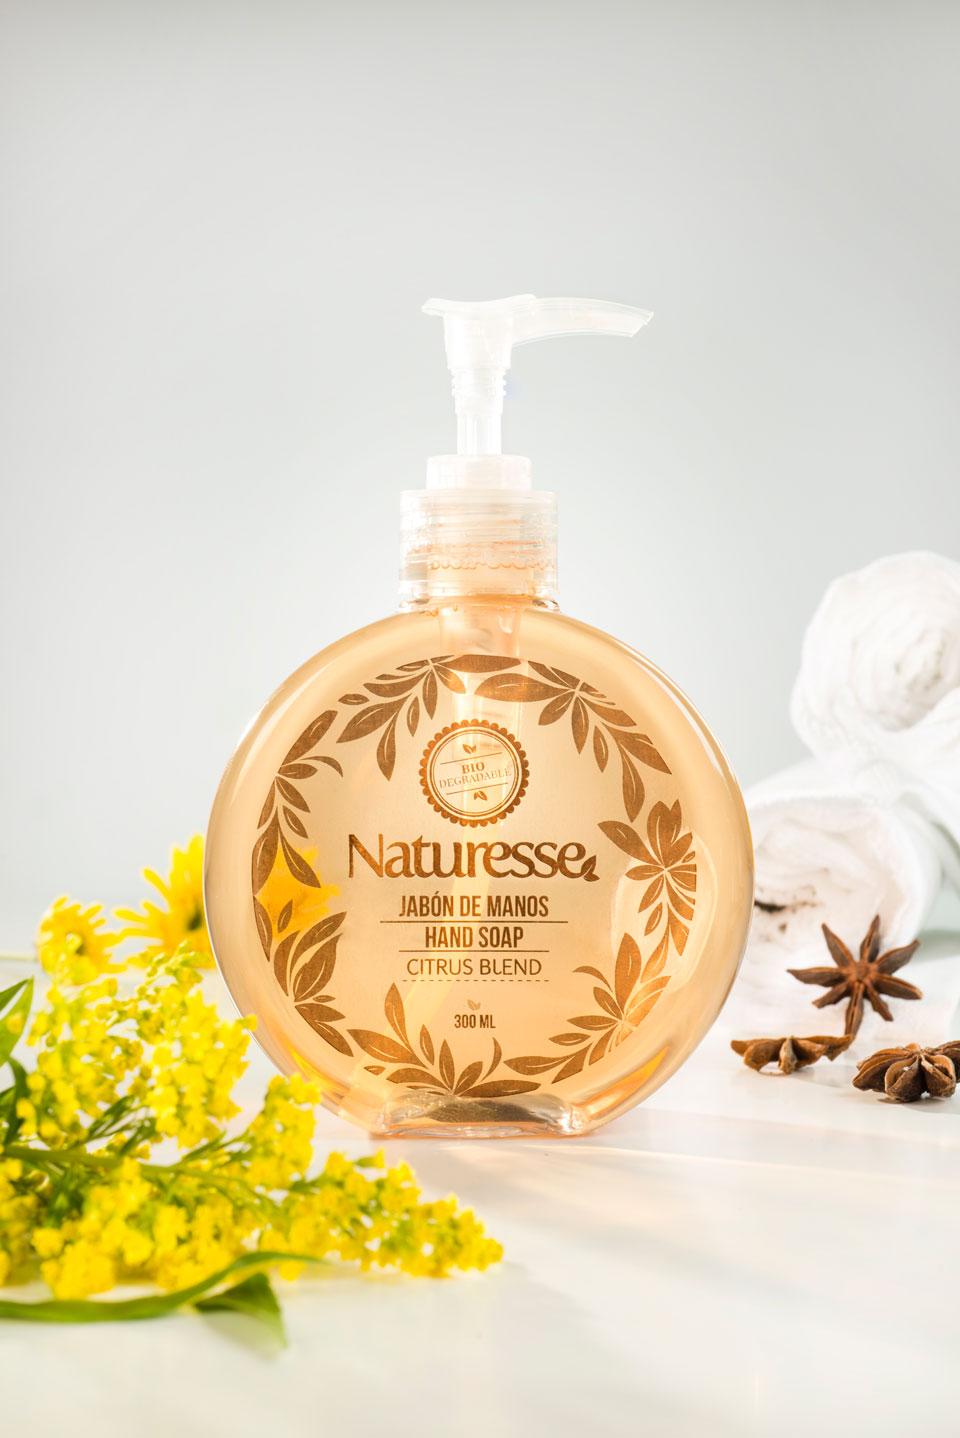 Jabón de manos líquido  | 300ml | Aroma  Citrus     Blend